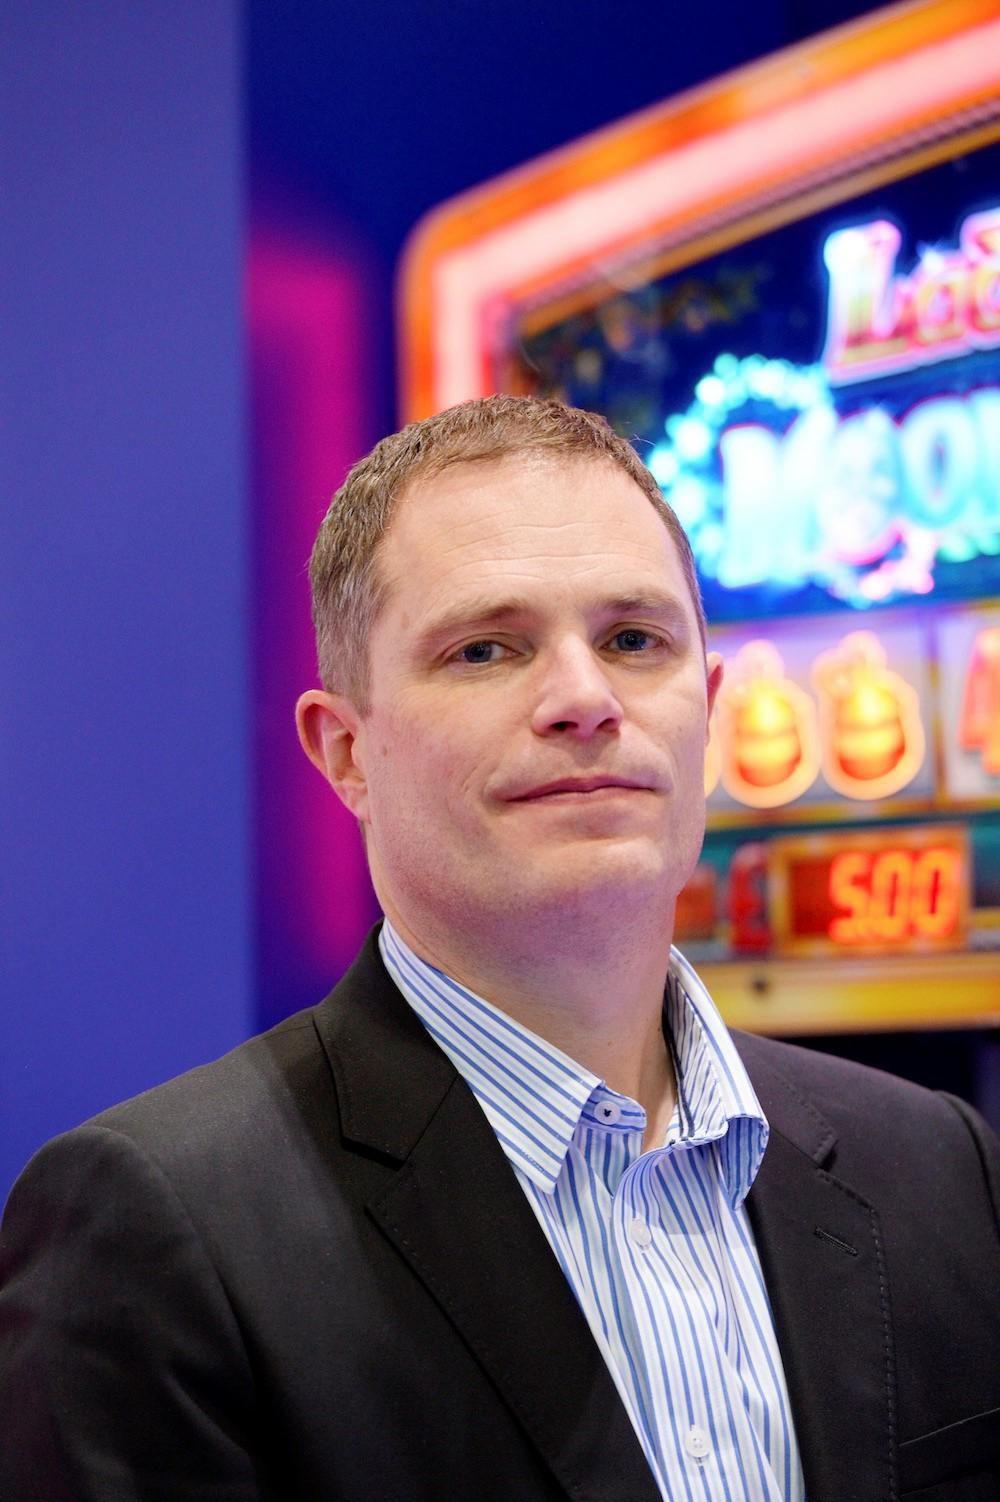 Mat Ingram, Chief Product Officer at Reflex